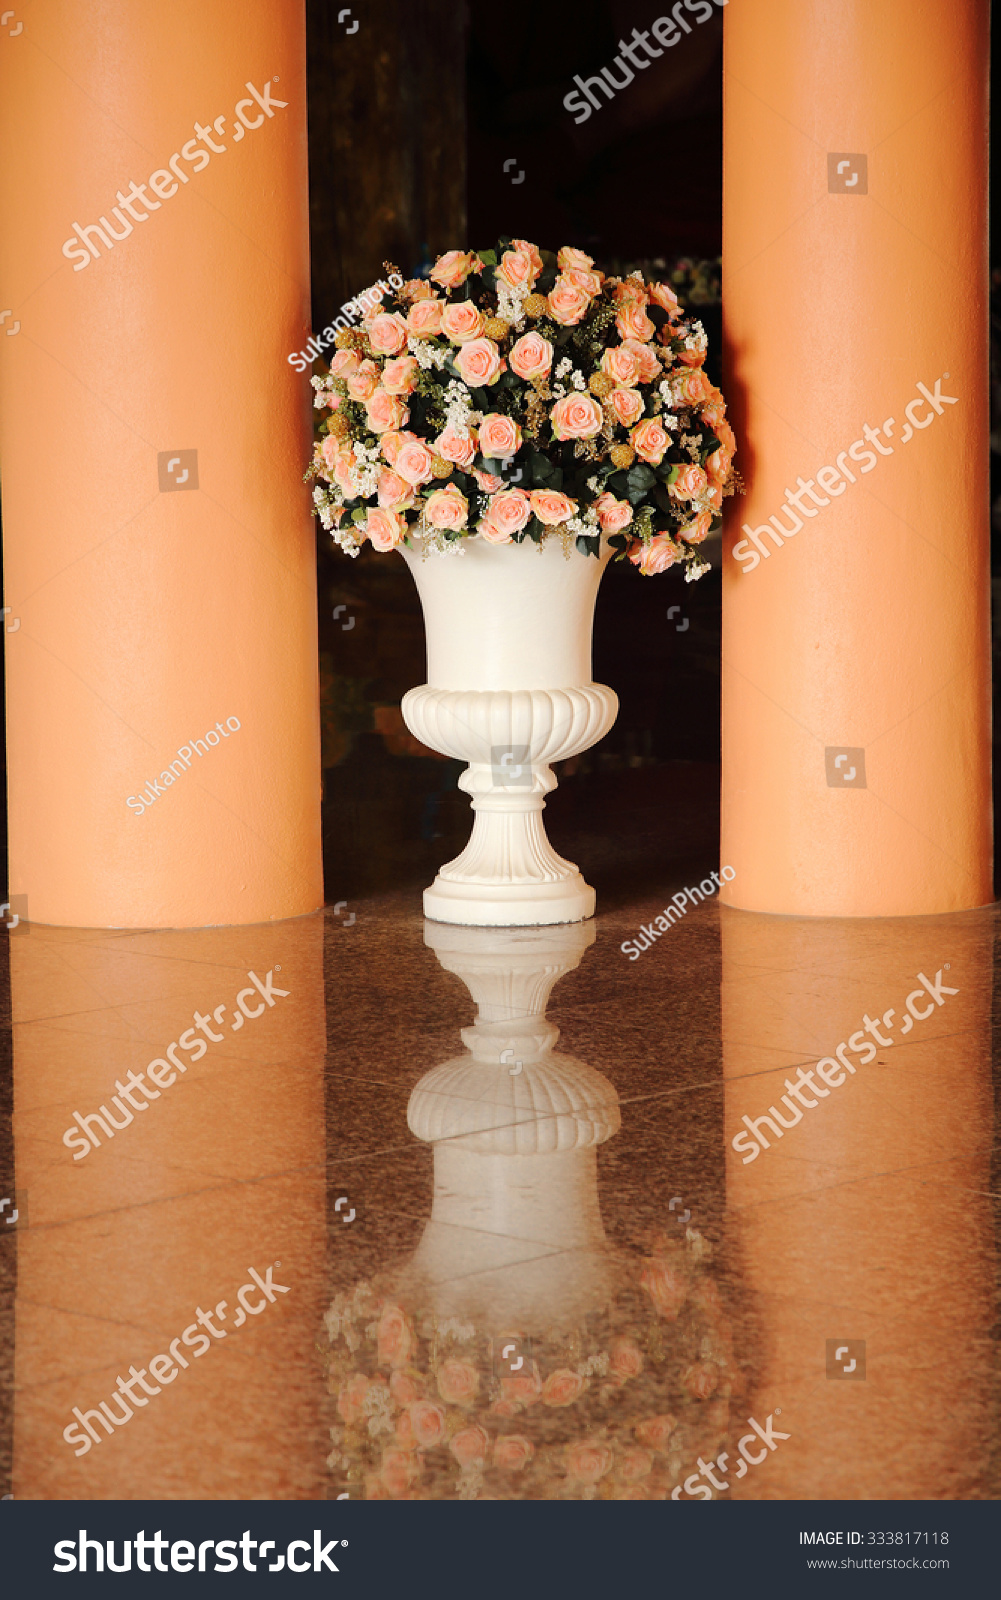 Large flower vase reflect on floor stock photo 333817118 large flower vase reflect on floor stock photo 333817118 shutterstock reviewsmspy